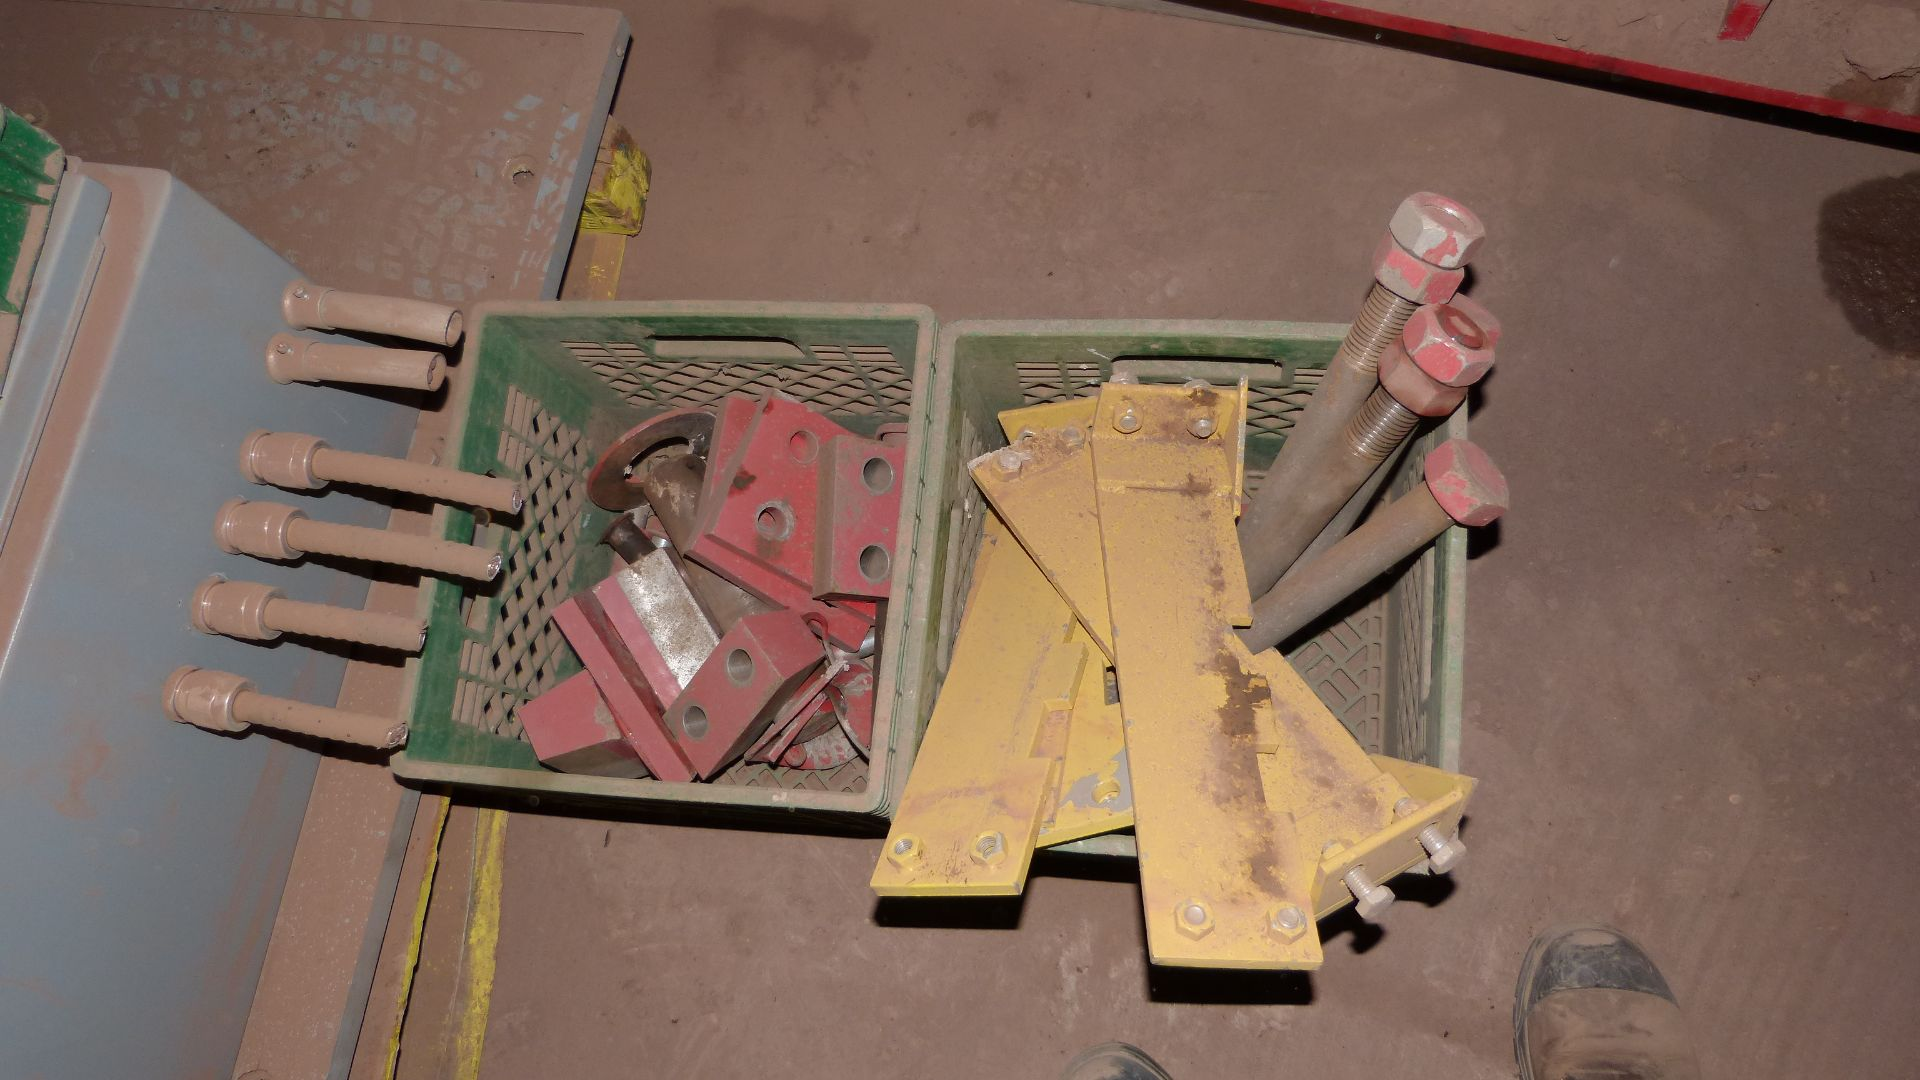 HAZEMAG IMPACT CRUSHER, MODEL 1315, 60'' DIAMETER ROTOR, 60'' WIDE, 575V, 450 HP - Image 17 of 25